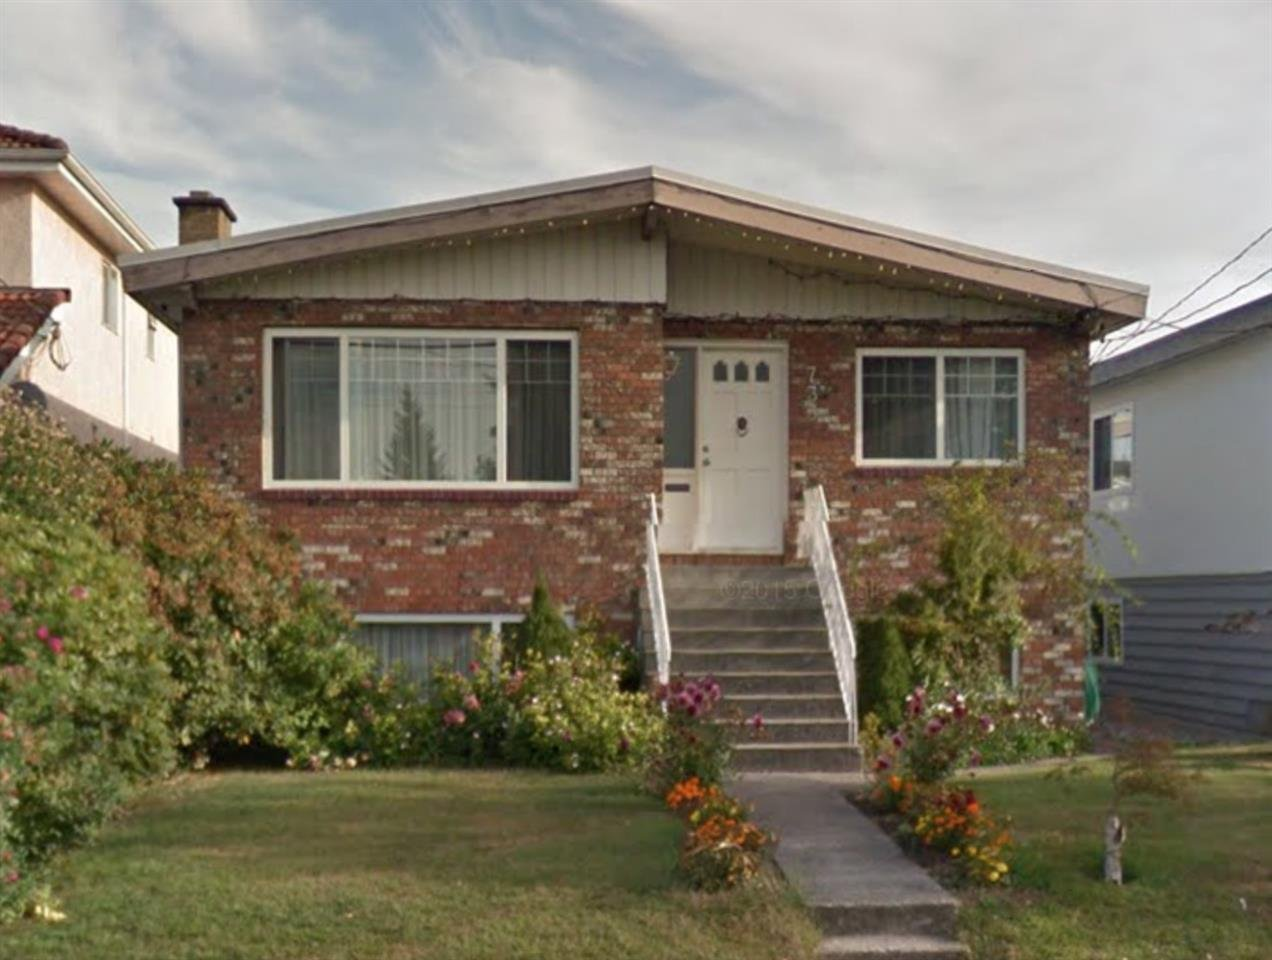 R2126615 - 733 E 54TH AVENUE, South Vancouver, Vancouver, BC - House/Single Family